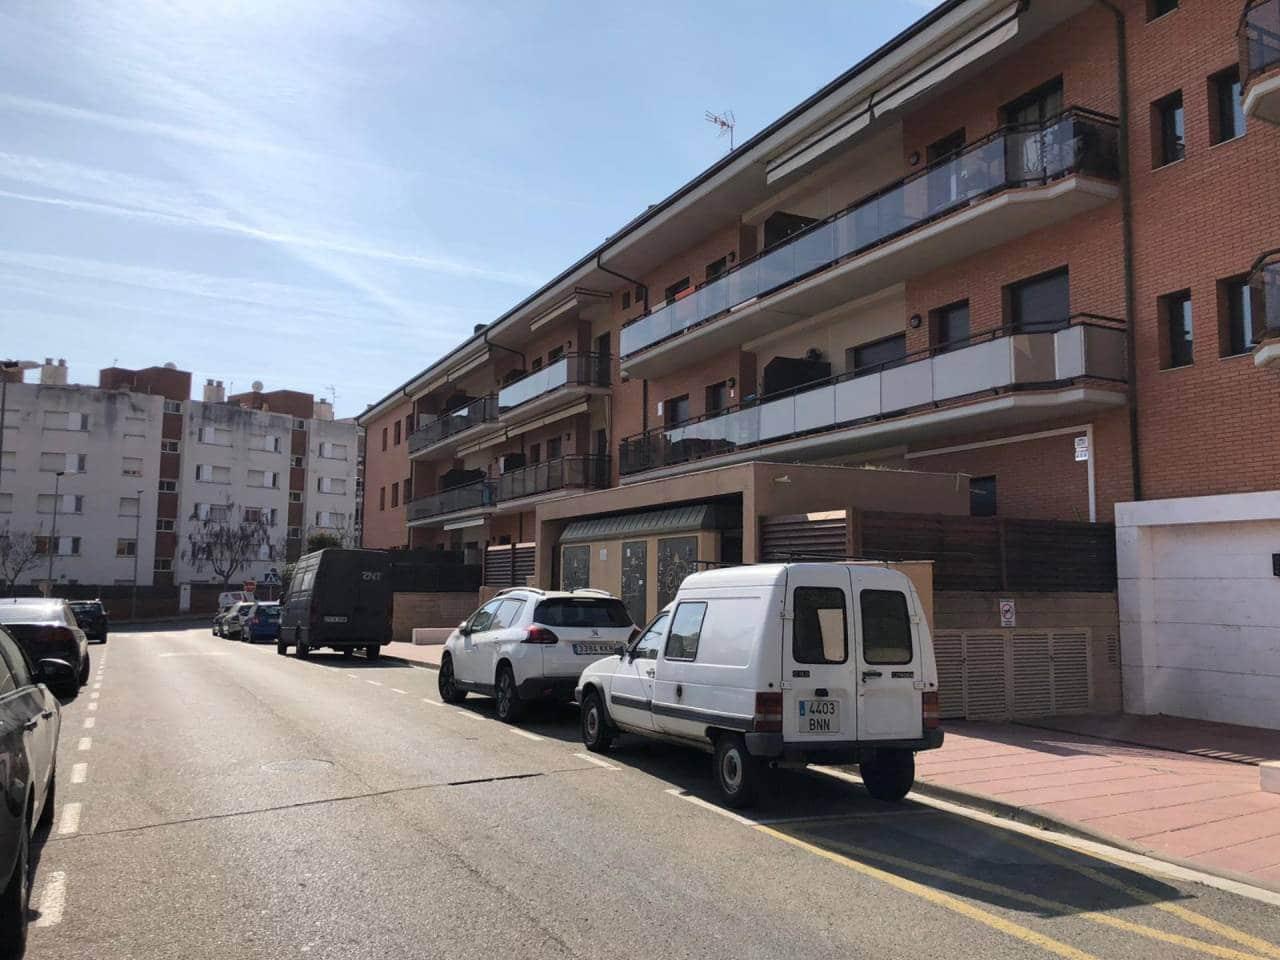 Garaż na sprzedaż w Lloret de Mar - 11 500 € (Ref: 6258050)